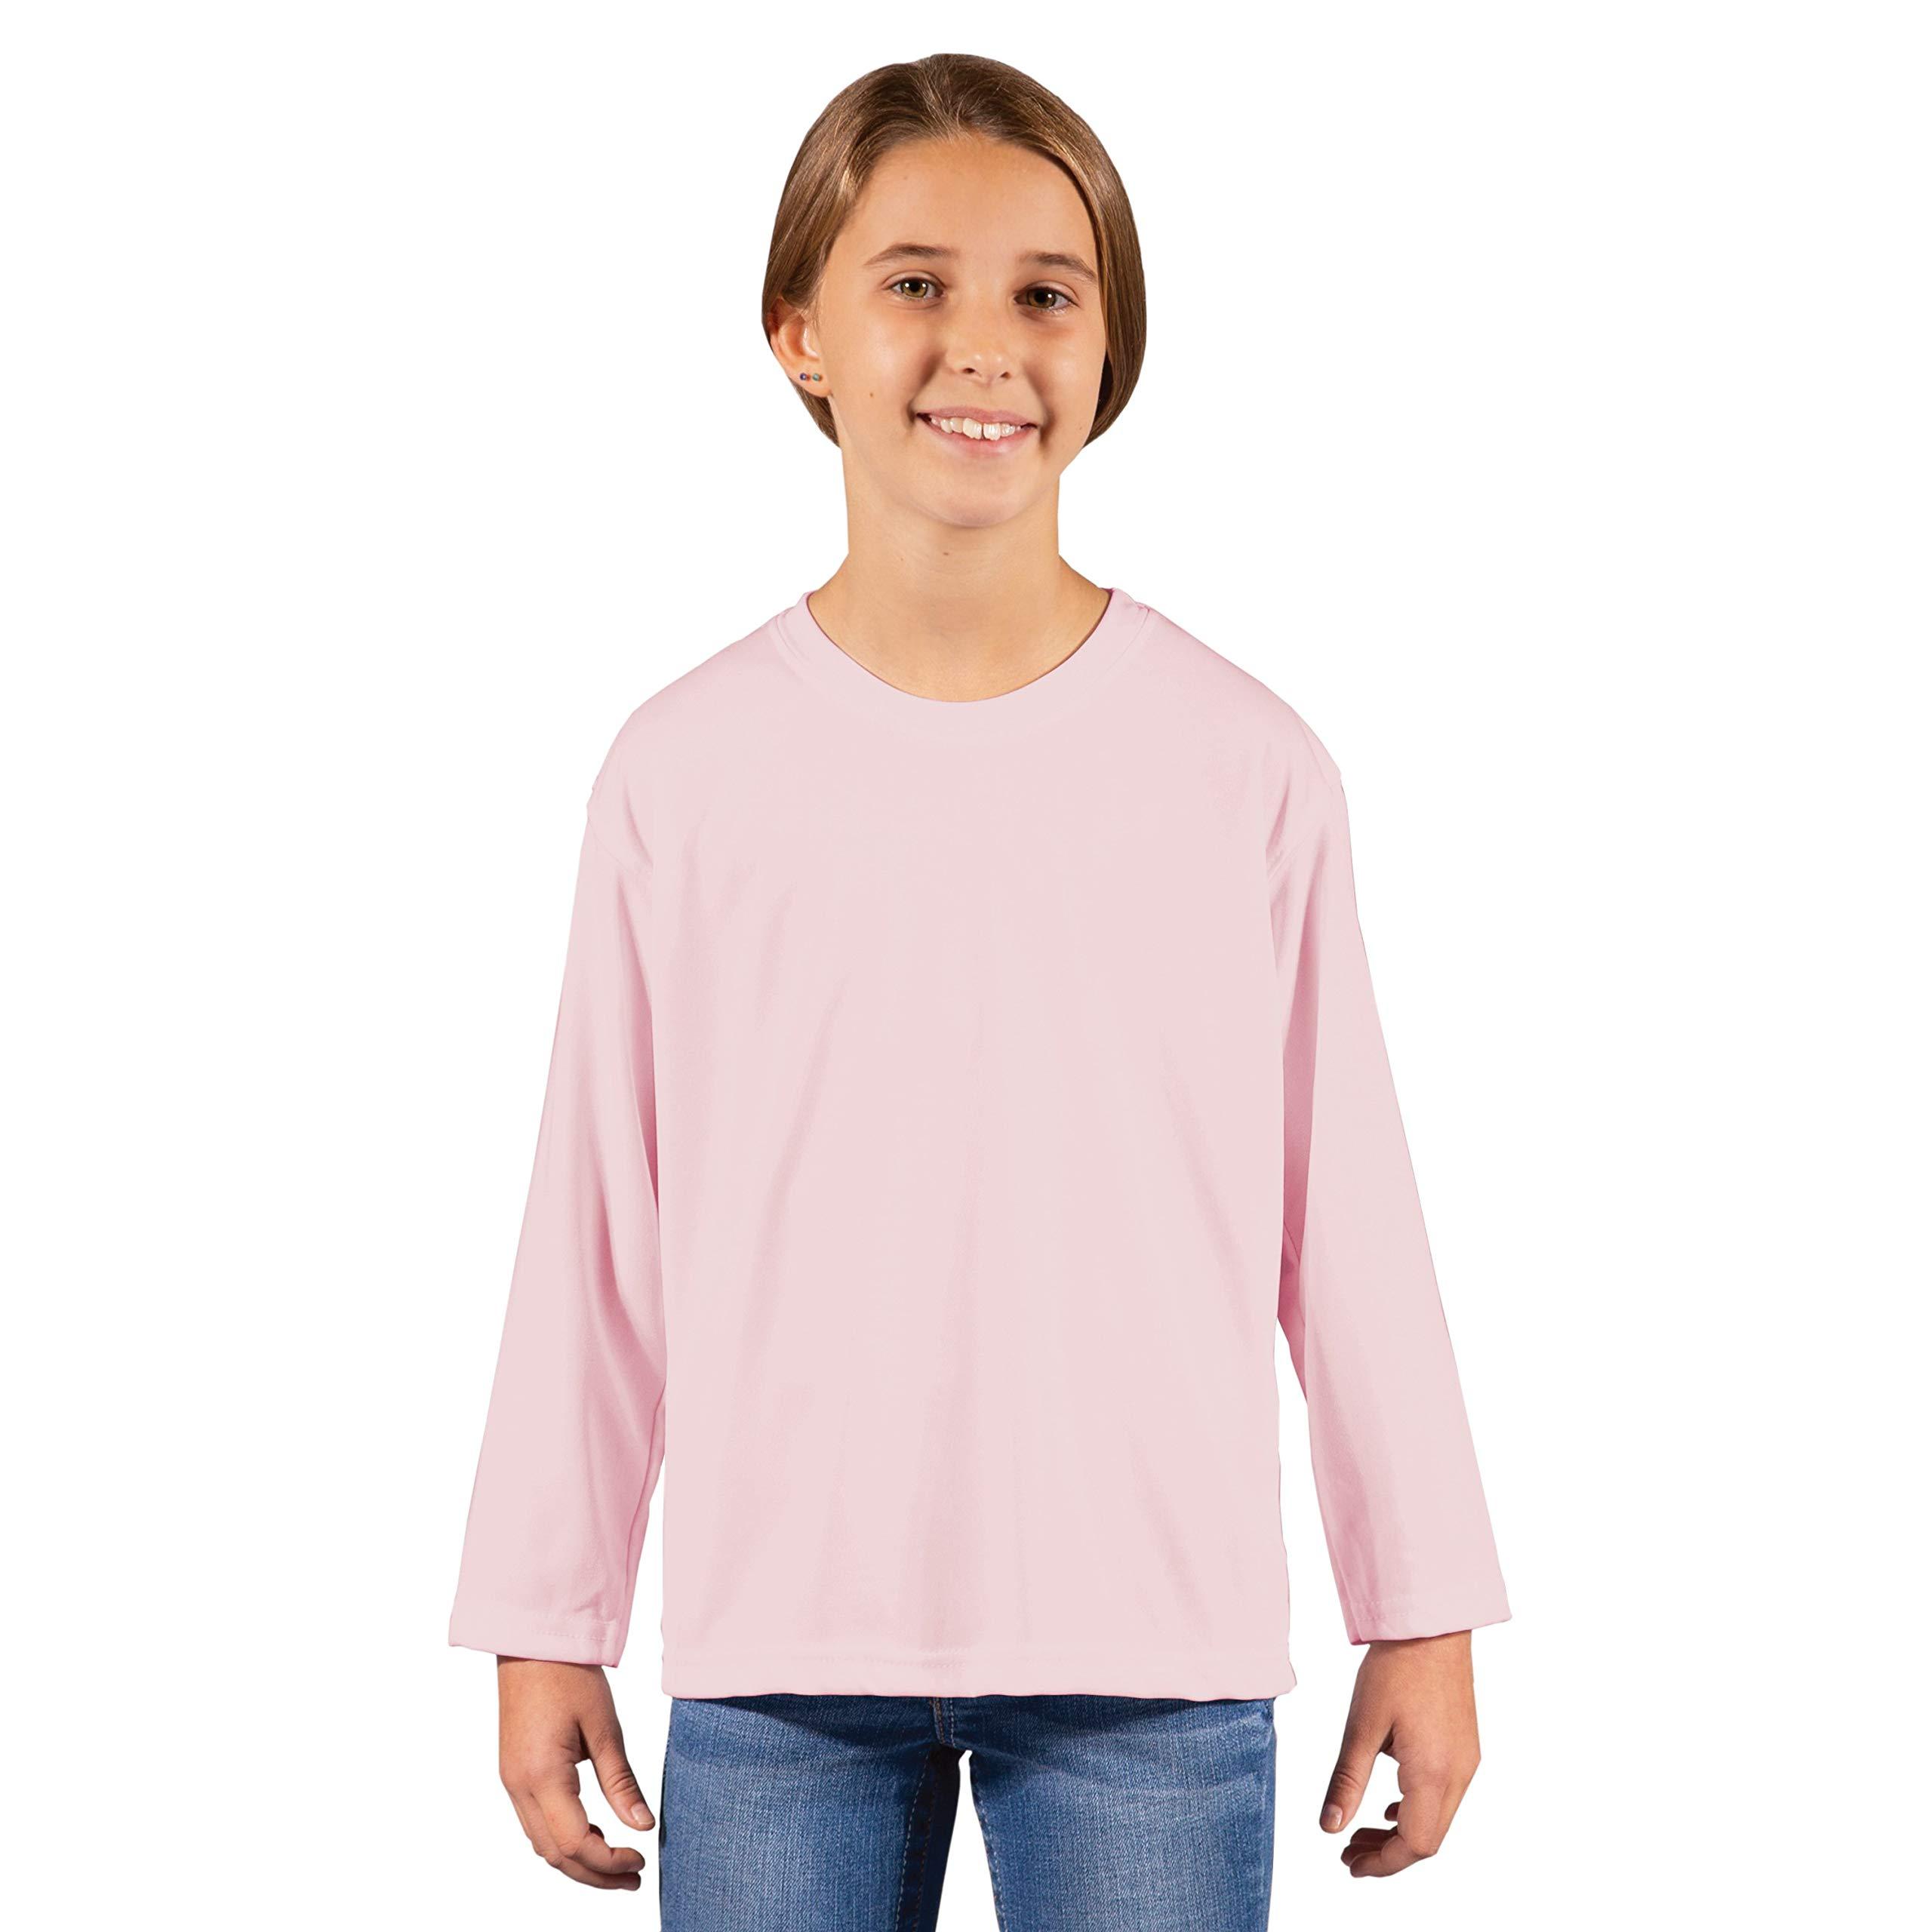 Vapor Apparel Youth UPF 50+ UV Sun Protection Performance Long Sleeve T-Shirt Medium Pink Blossom